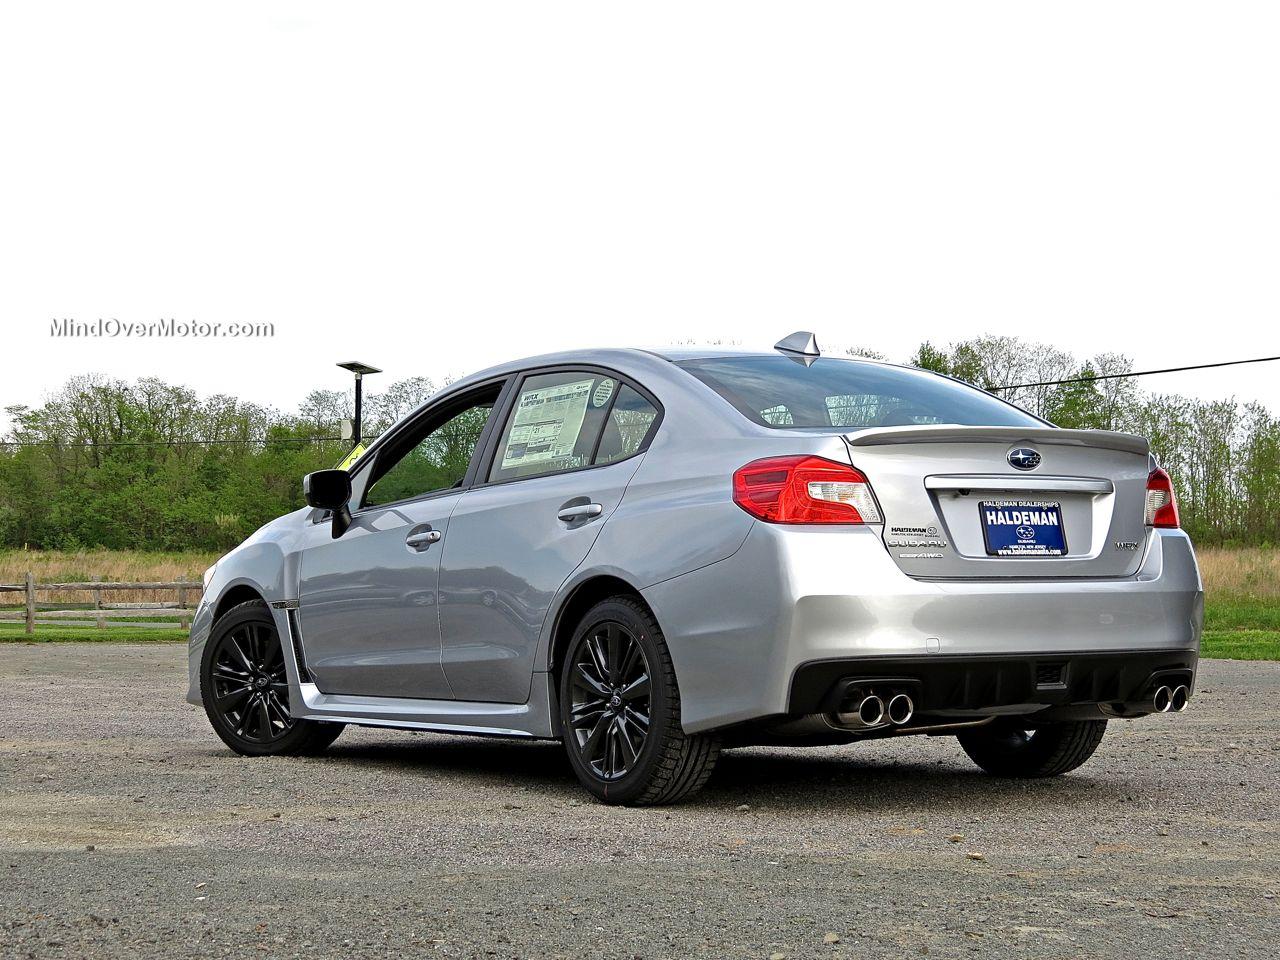 2015 Subaru WRX Rear View